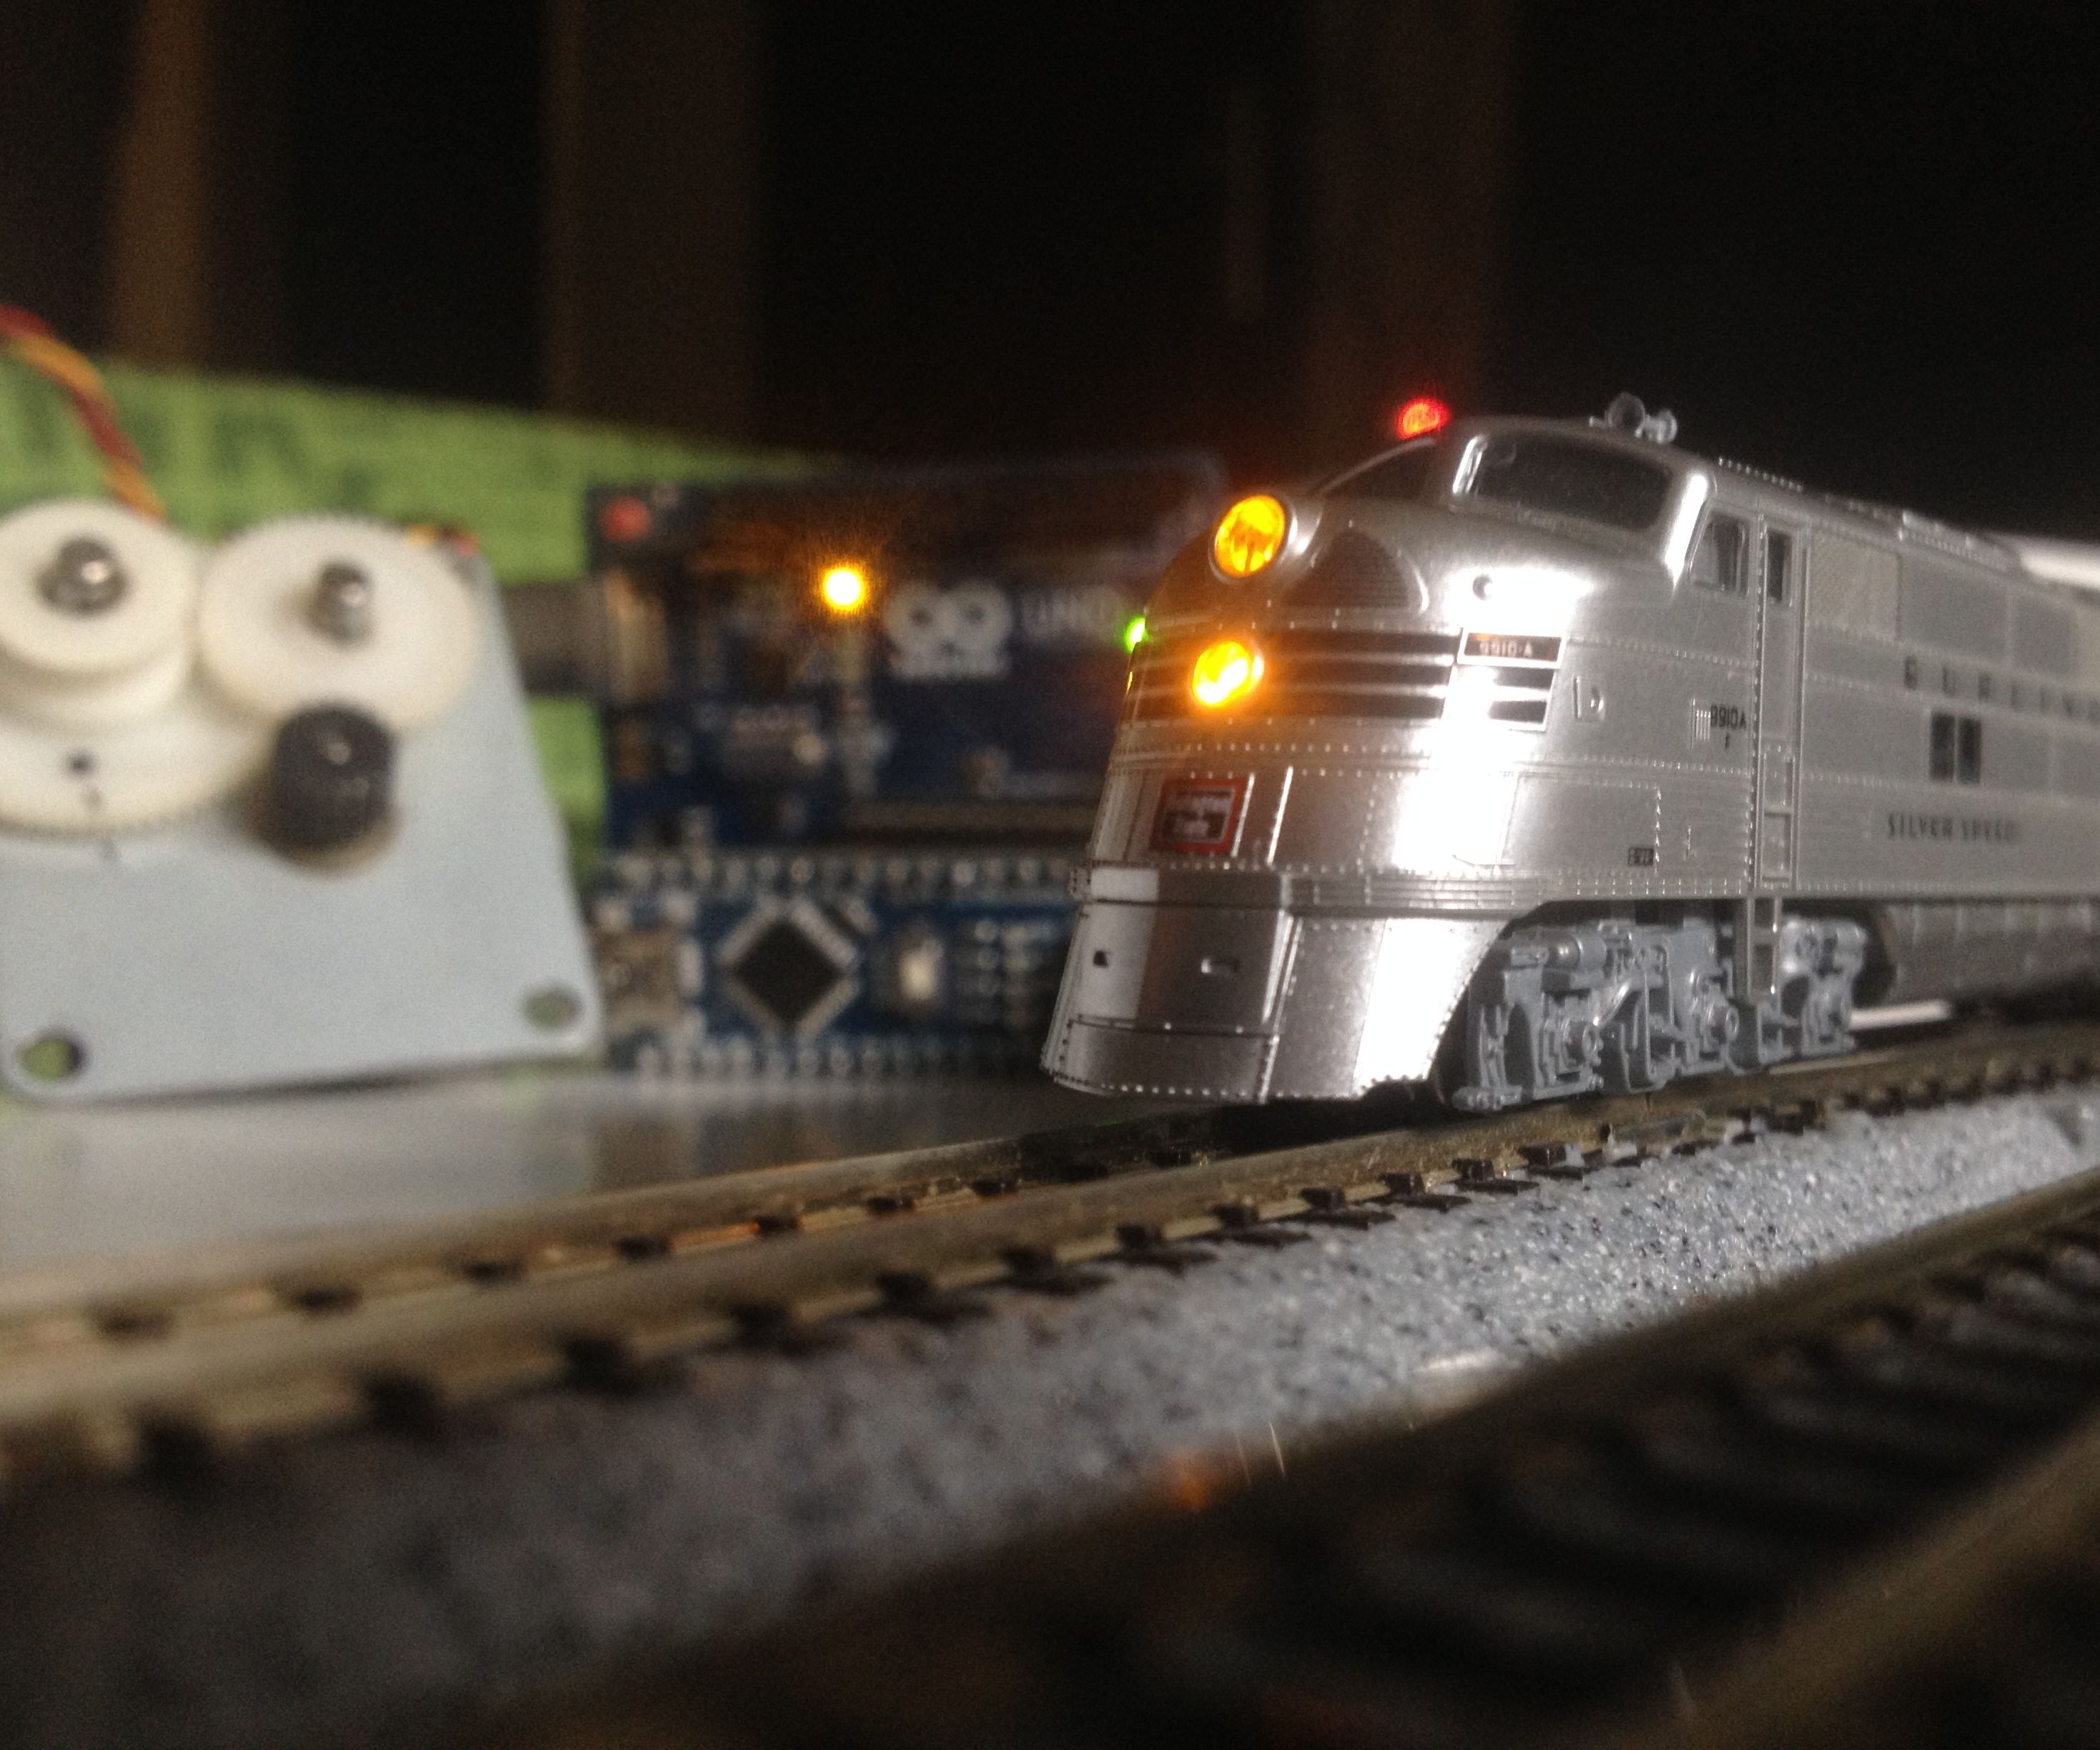 Stepper Motor Controlled Model Locomotive | Stepper Motor As a Rotary Encoder